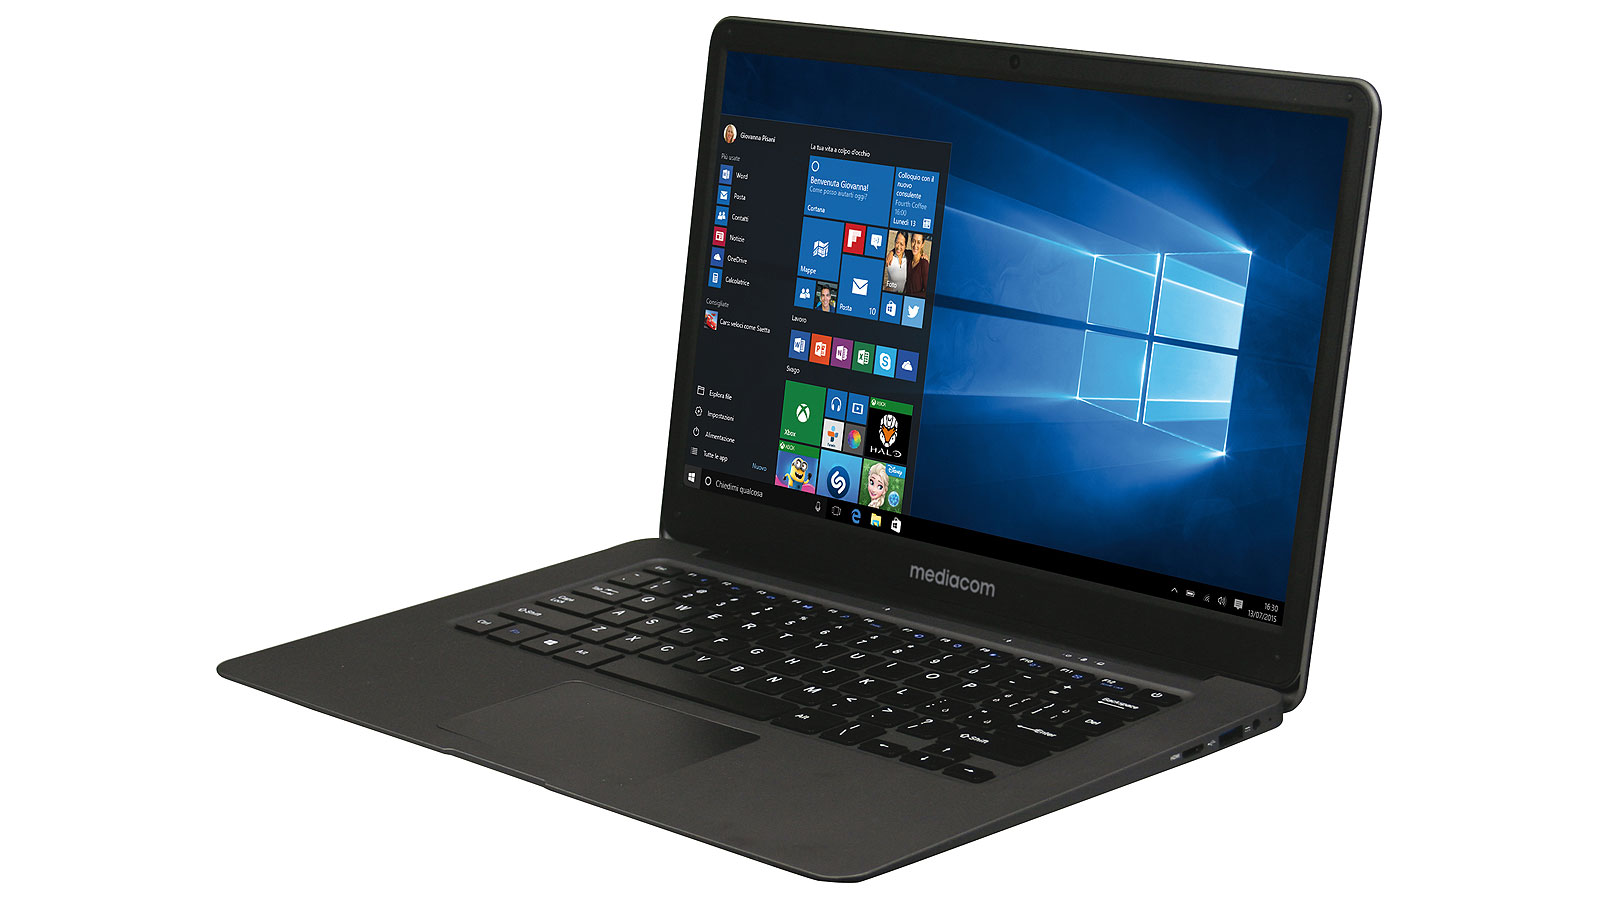 Mediacom laptop